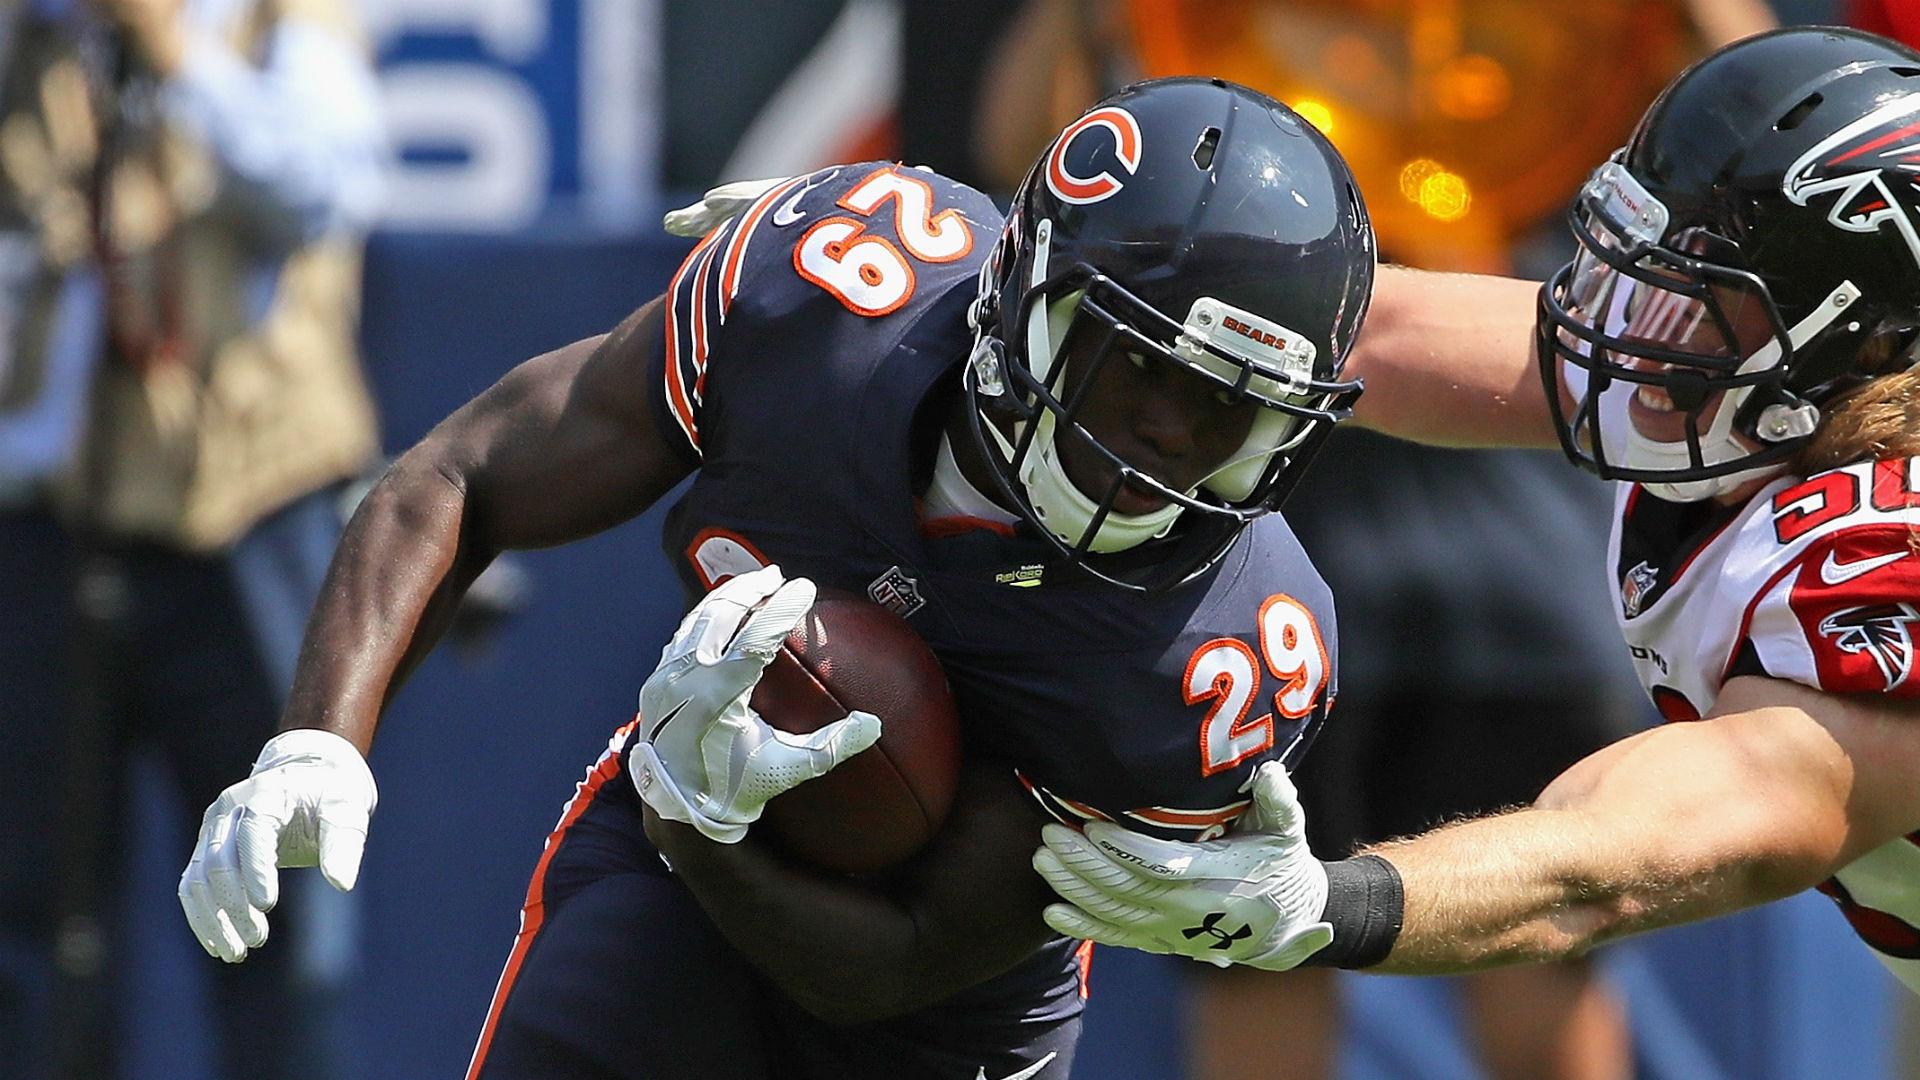 e2f364612e9 Rookie RB Tarik Cohen's breakout was part of Bears' plan against Falcons |  Sporting News